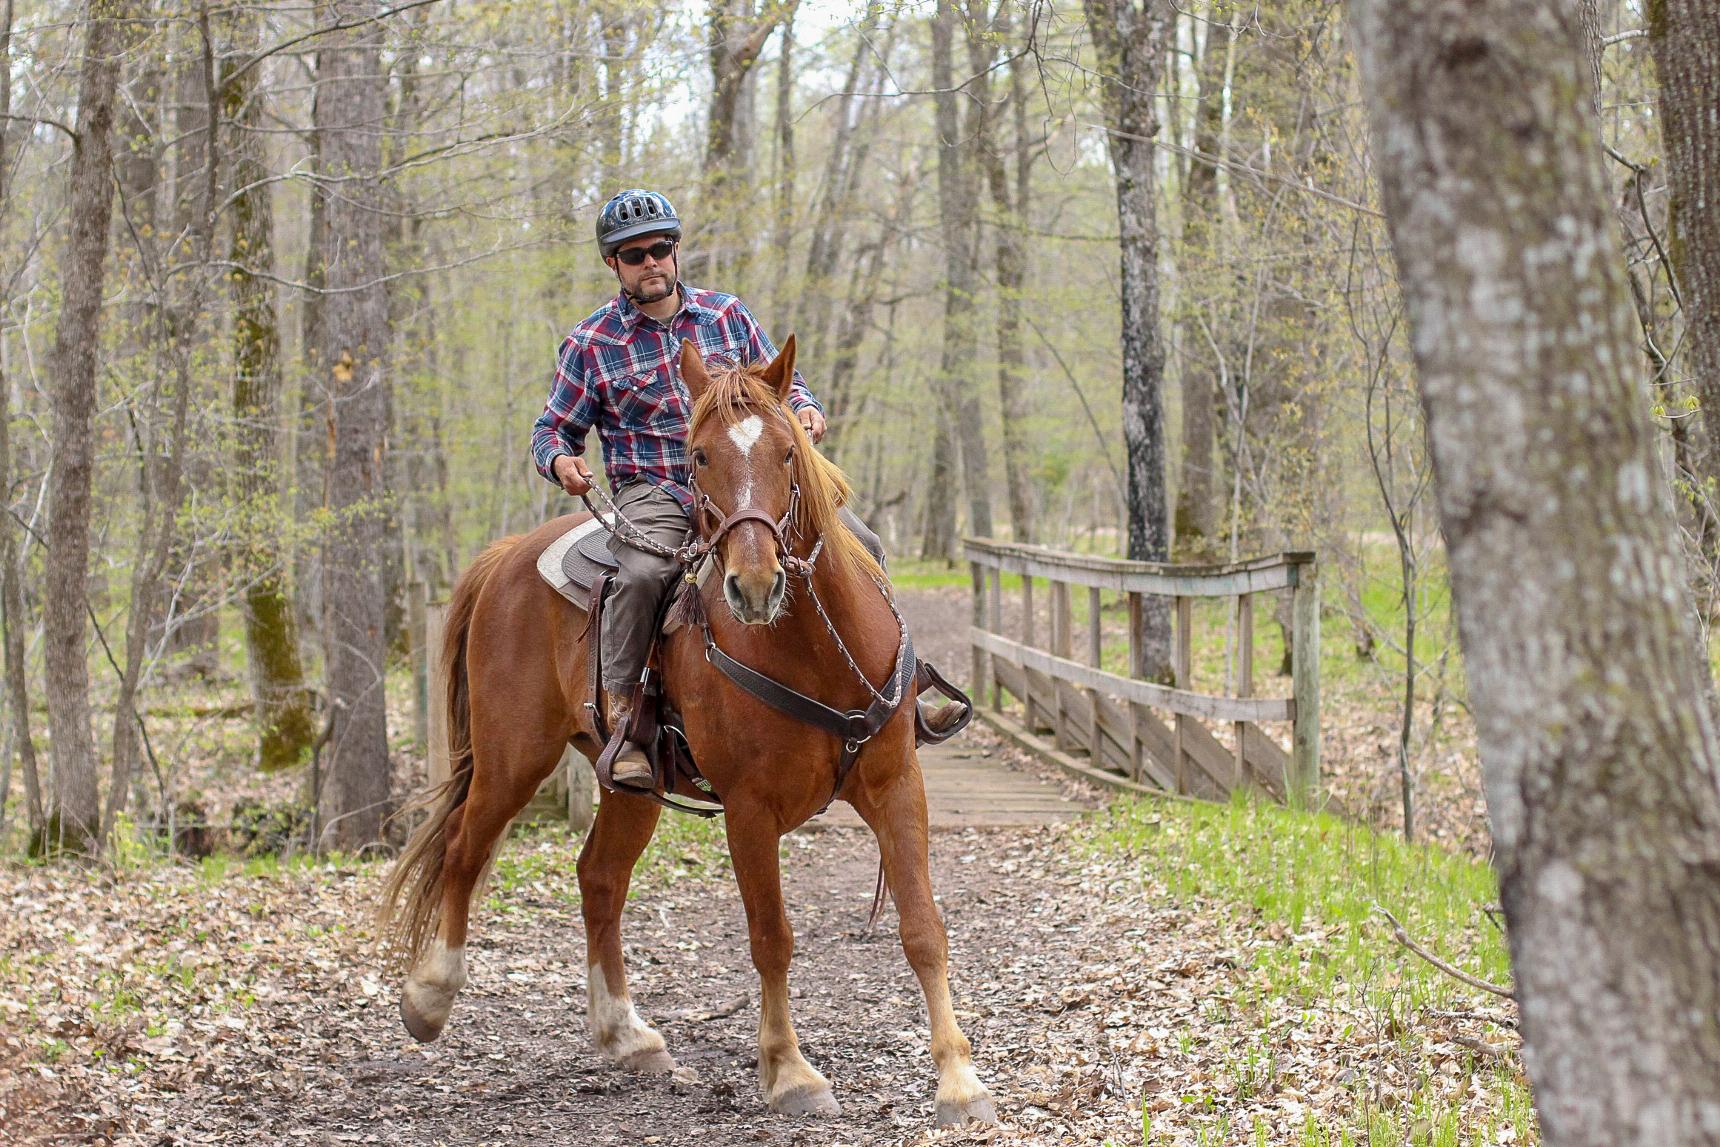 Minnesota Horseback Riding & Camping